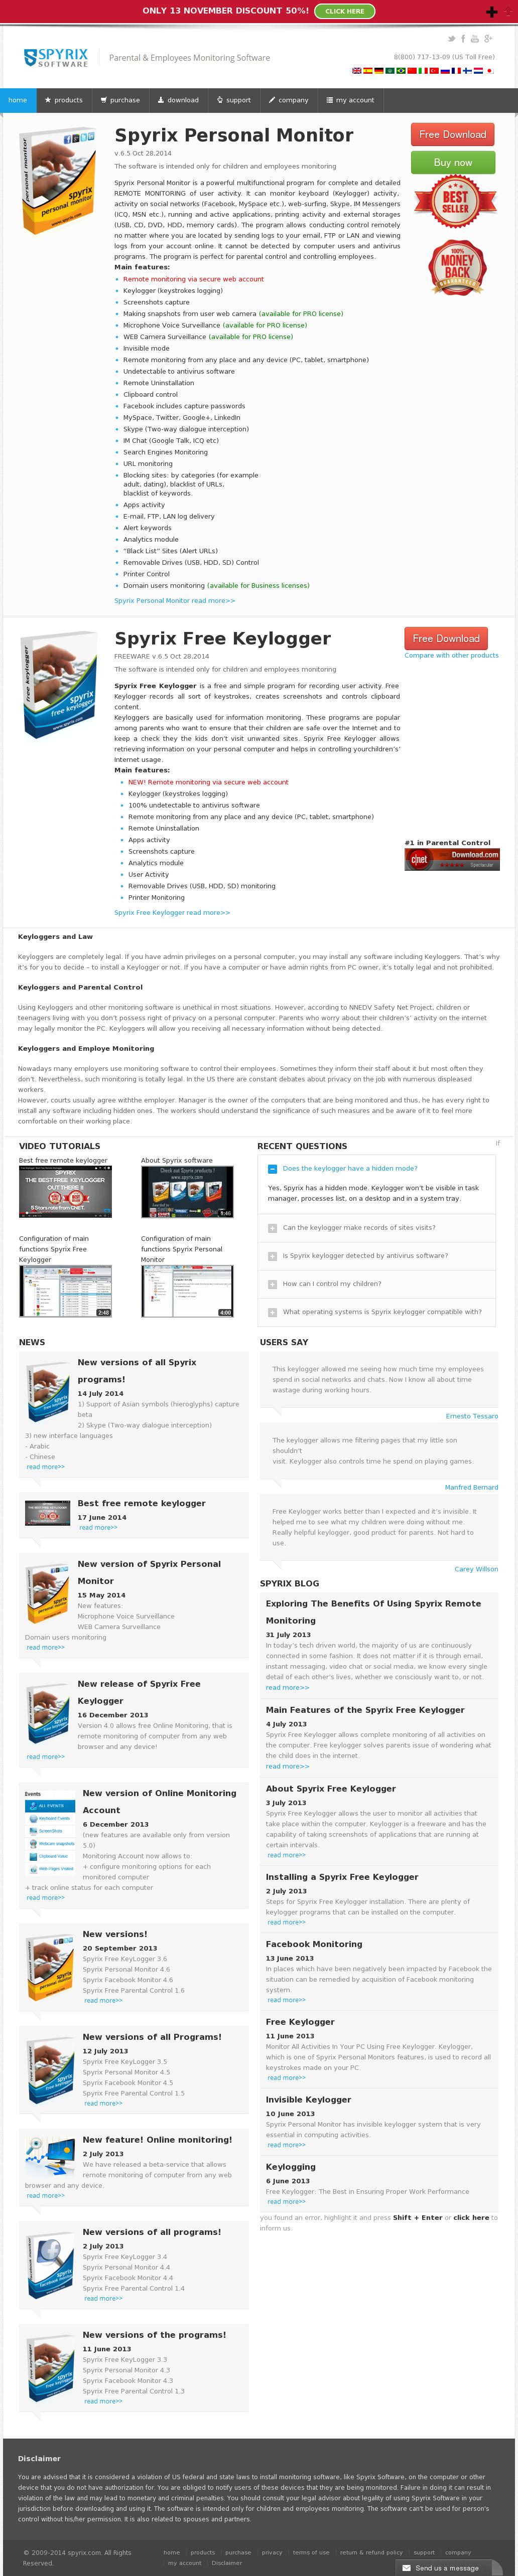 Spyrix Competitors, Revenue and Employees - Owler Company